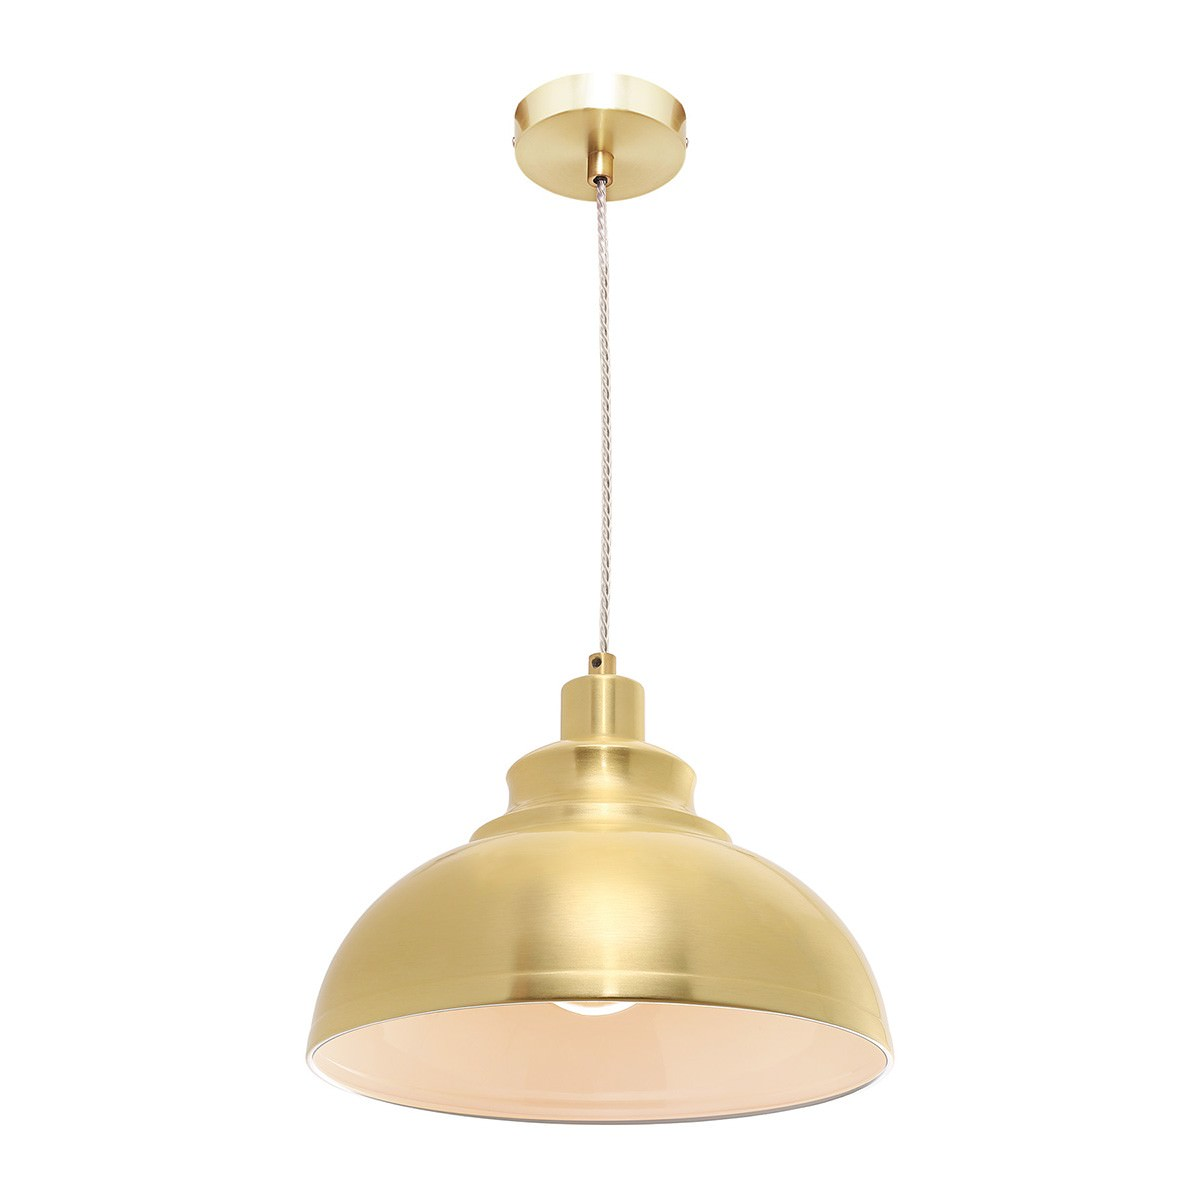 Risto Metal Pendant Light, Satin Brass